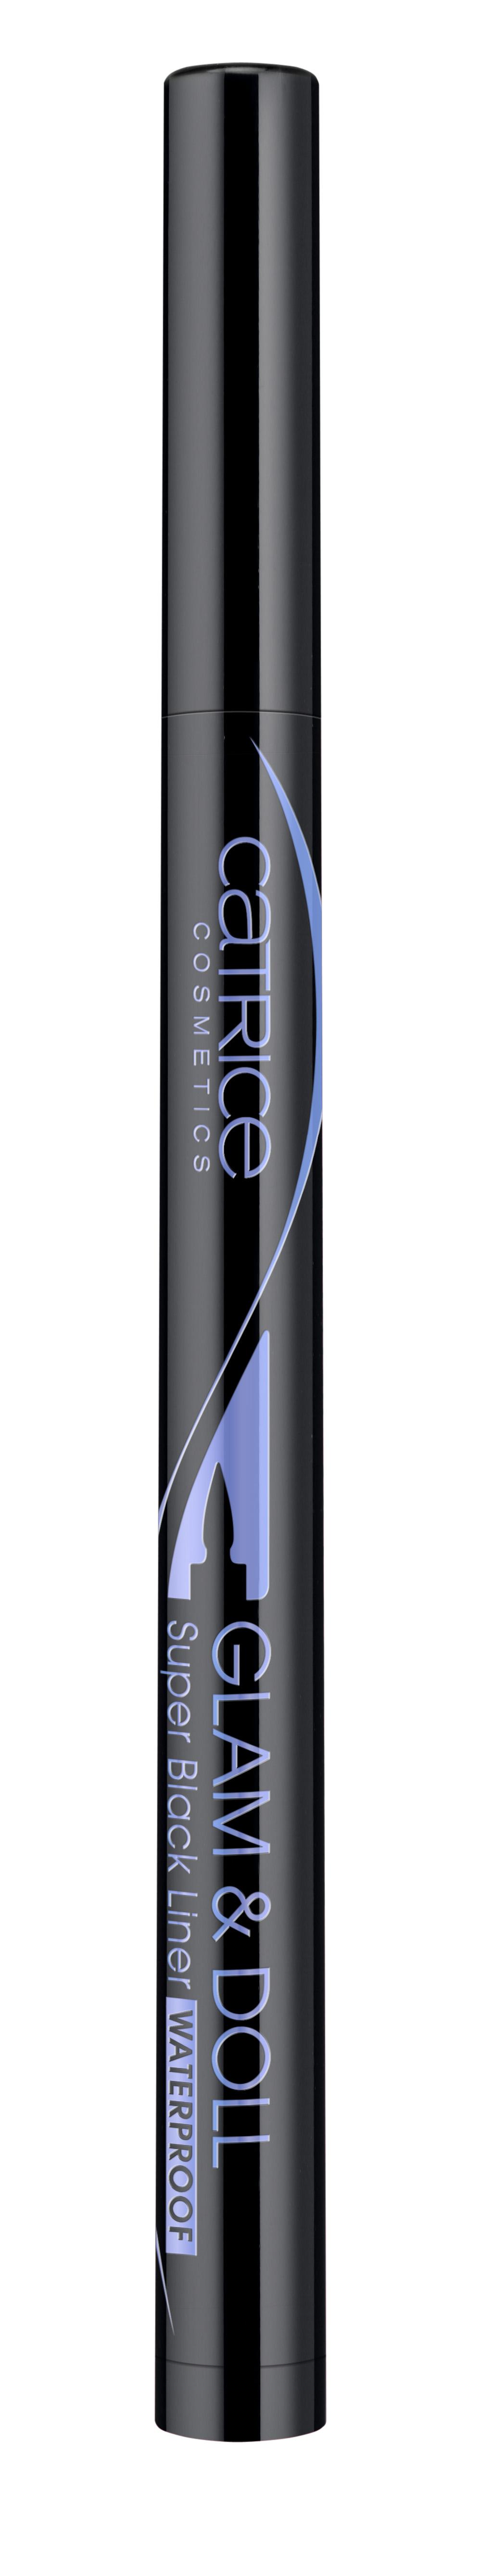 Catrice Glam & Doll Super Black Liner Waterproof 010